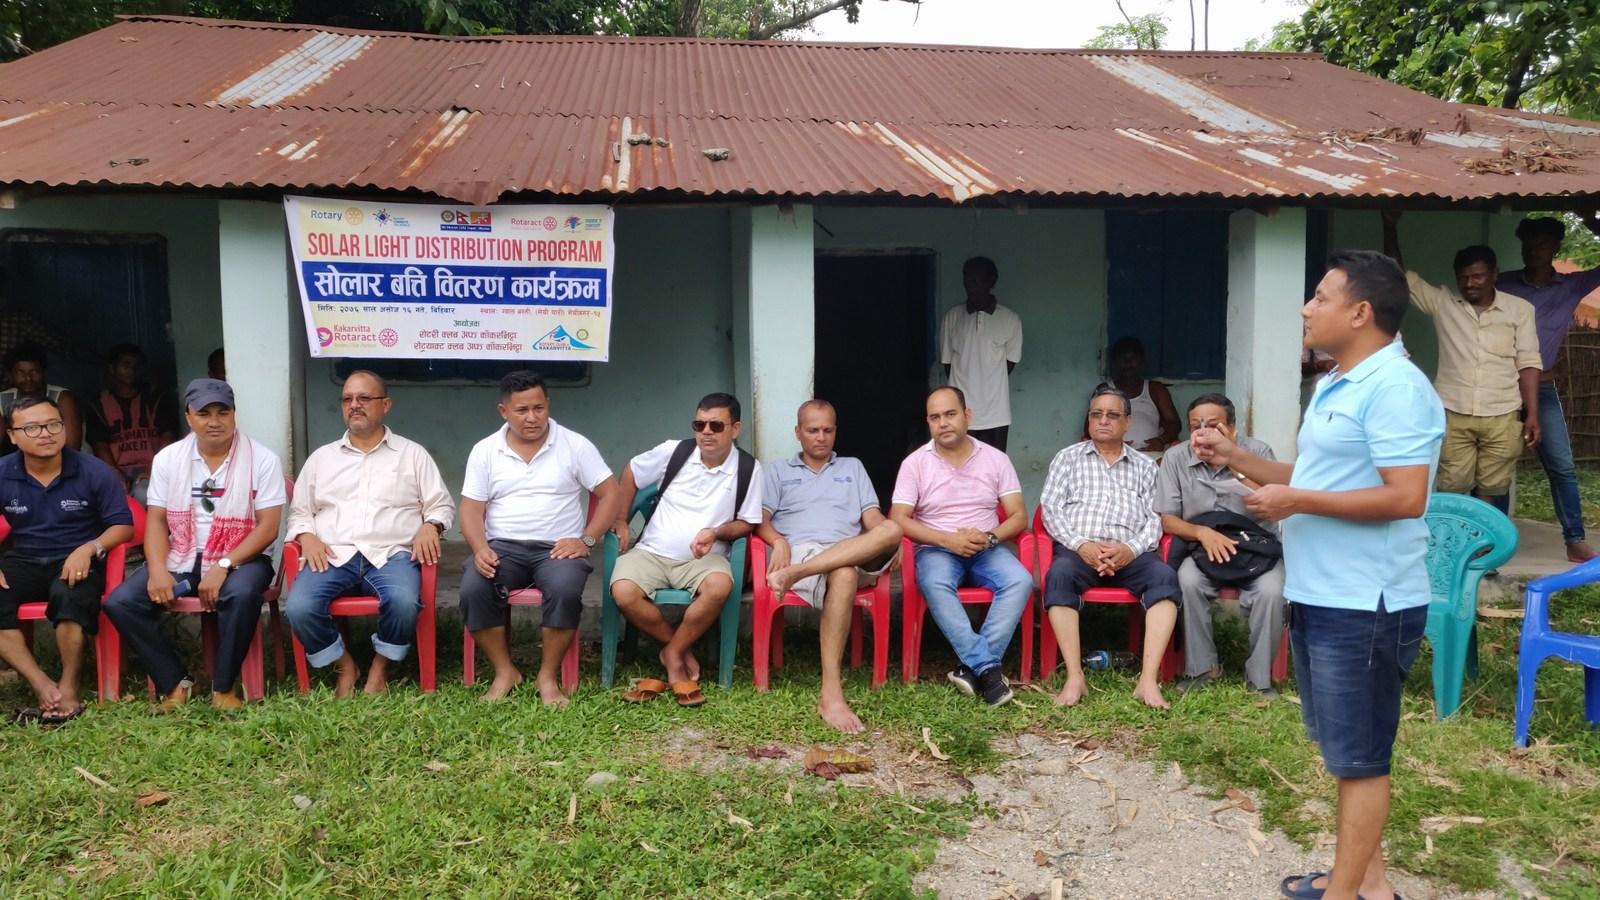 Solar-Light-Distribution-Program-Rotary-Club-of-Kakarvitta-2